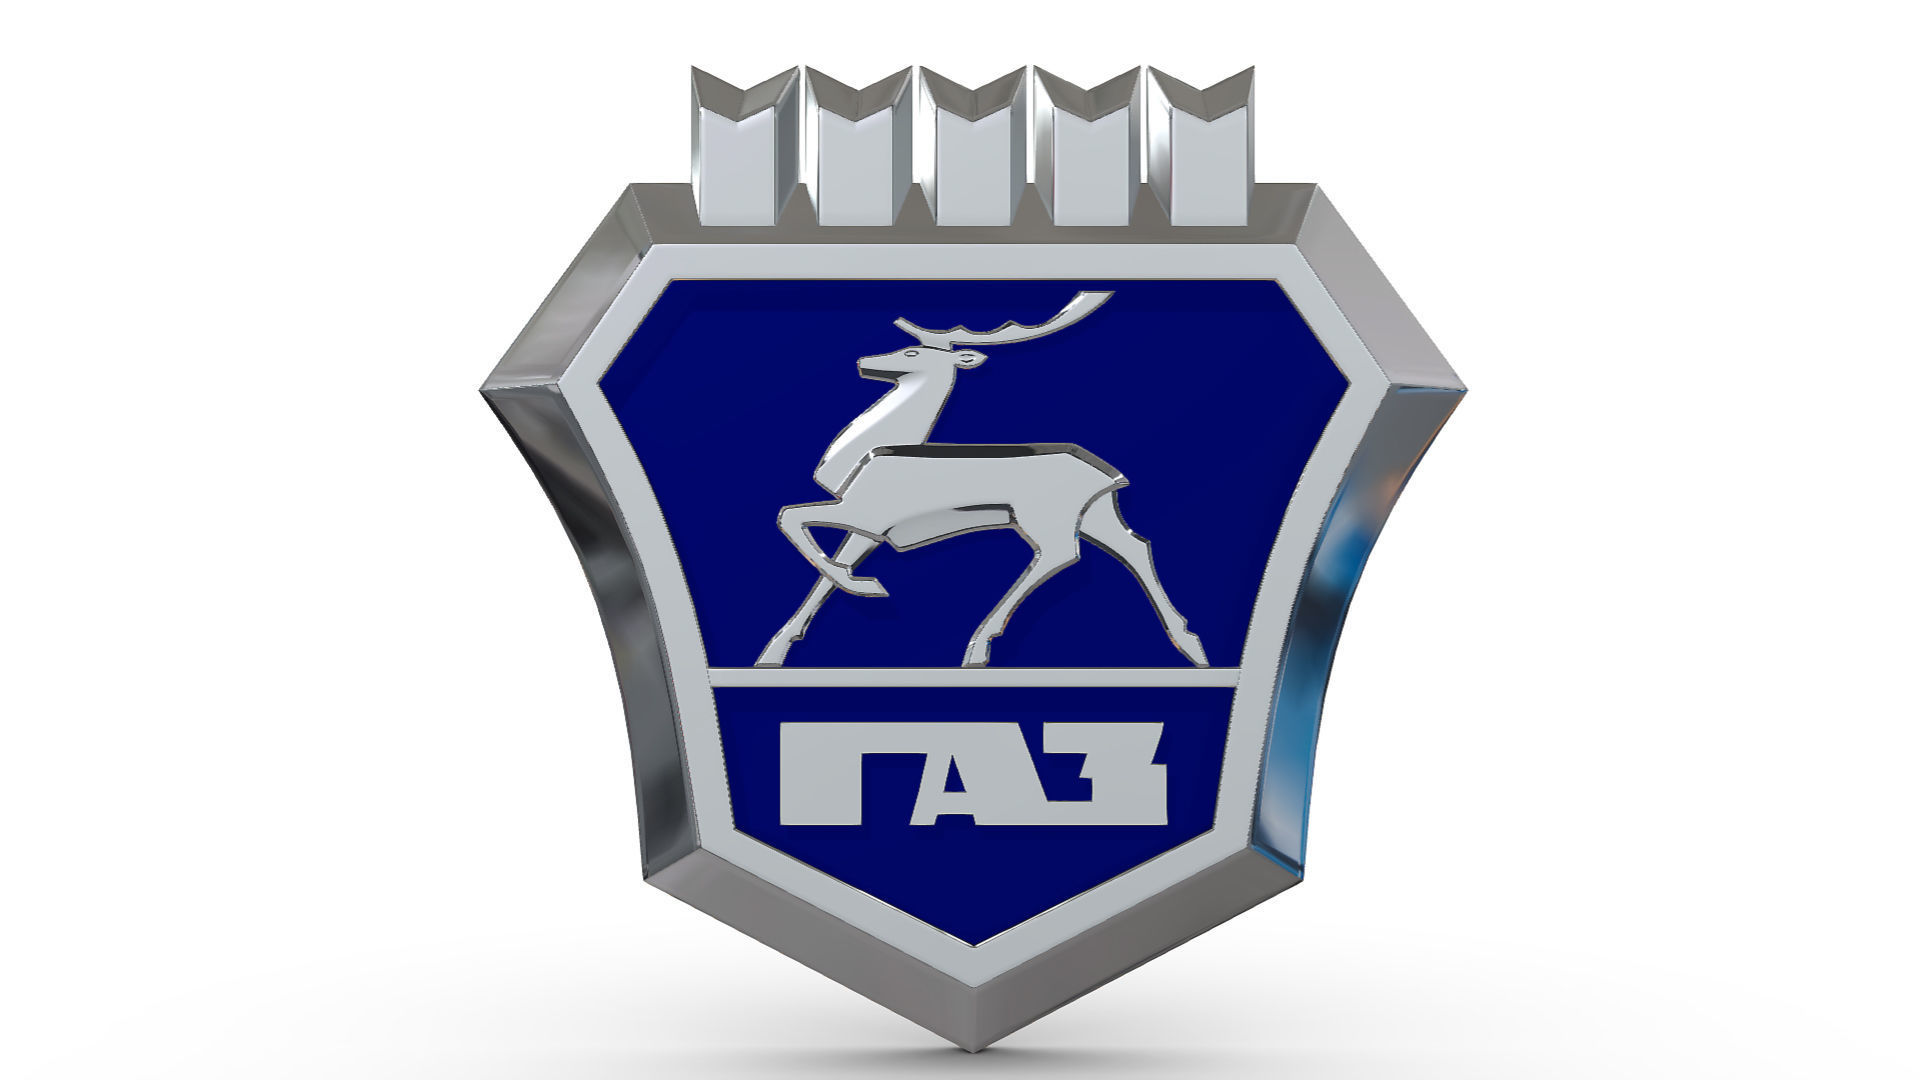 Gaz logo 2